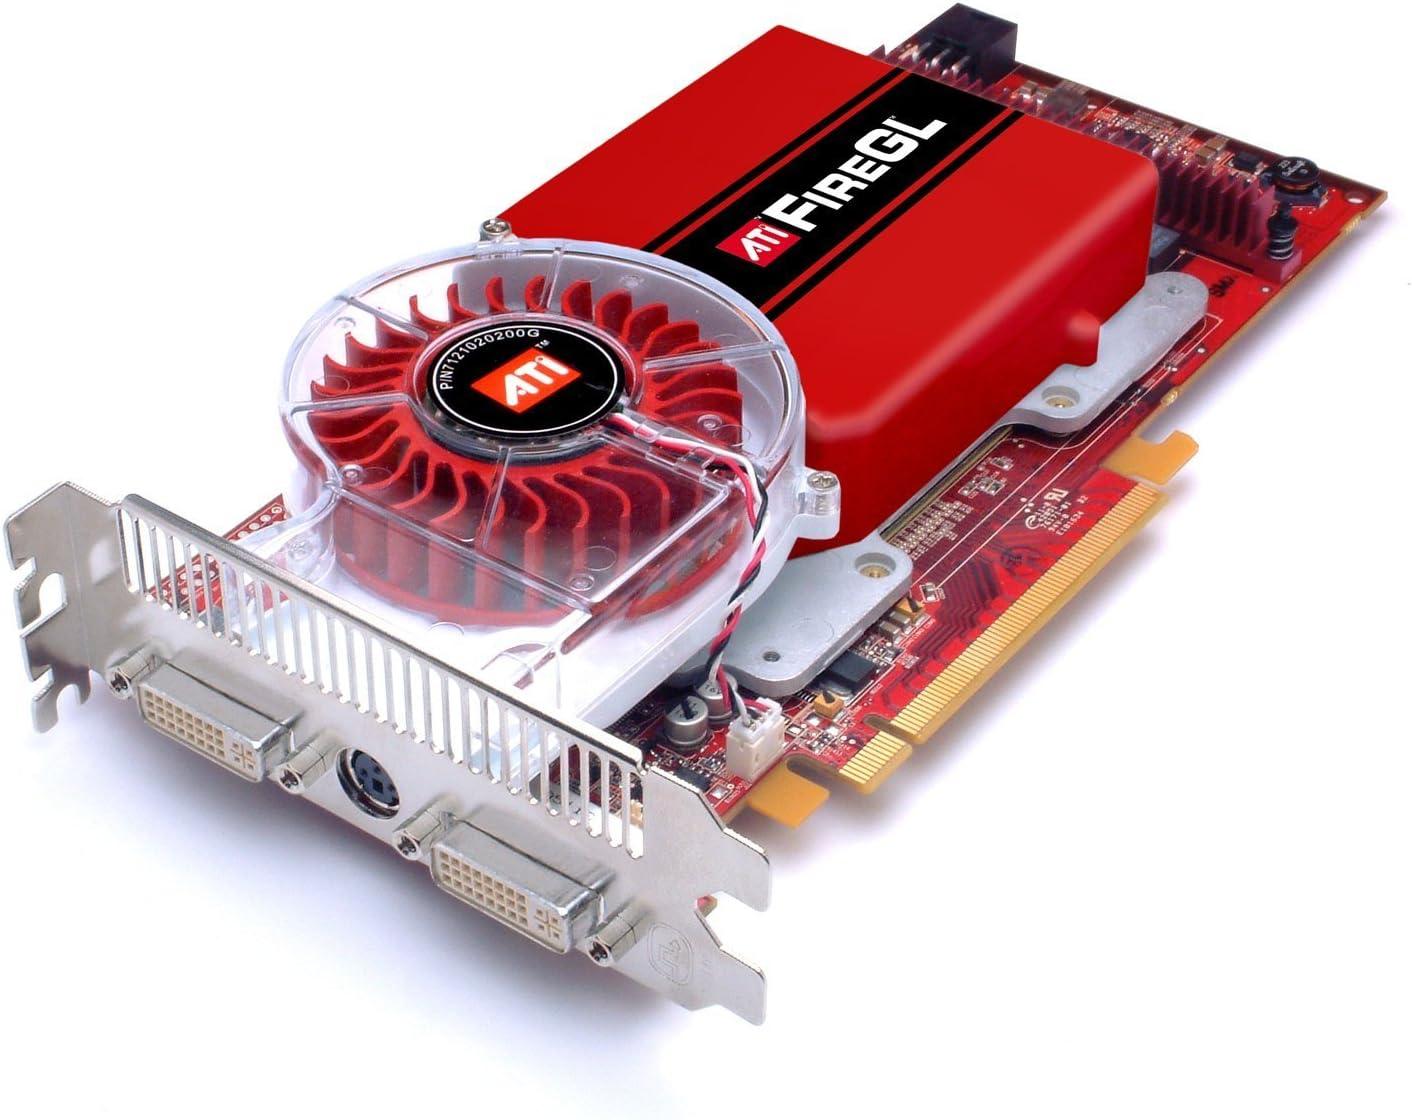 ATI FireGL V7300 512 MB PCIE Video Card